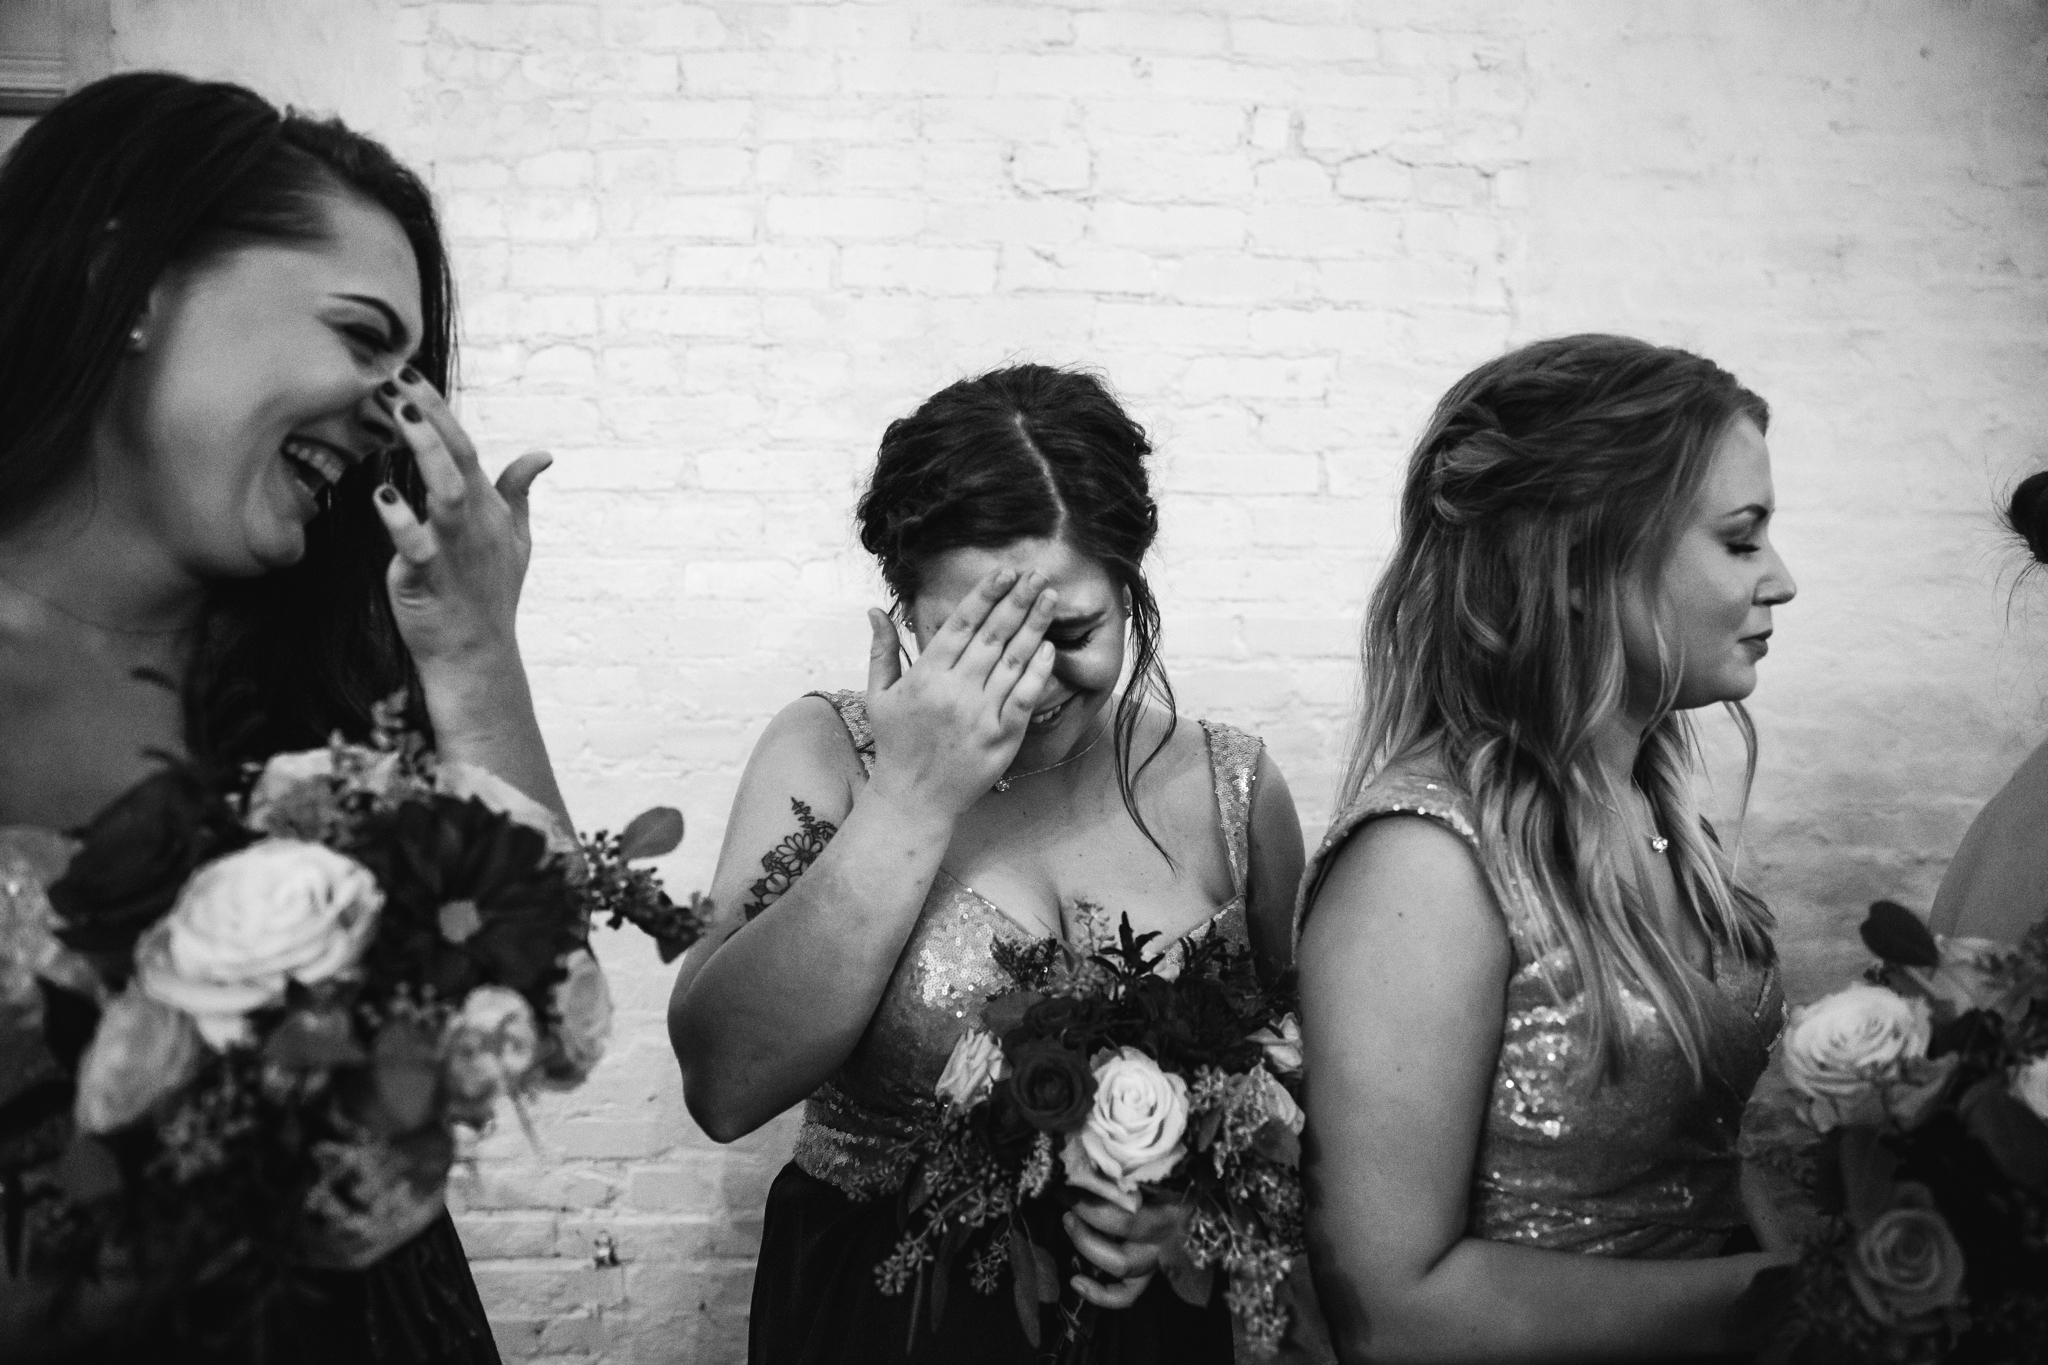 memphis-wedding-photographers-thewarmtharoundyou-ballinese-ballroom (144 of 232).jpg